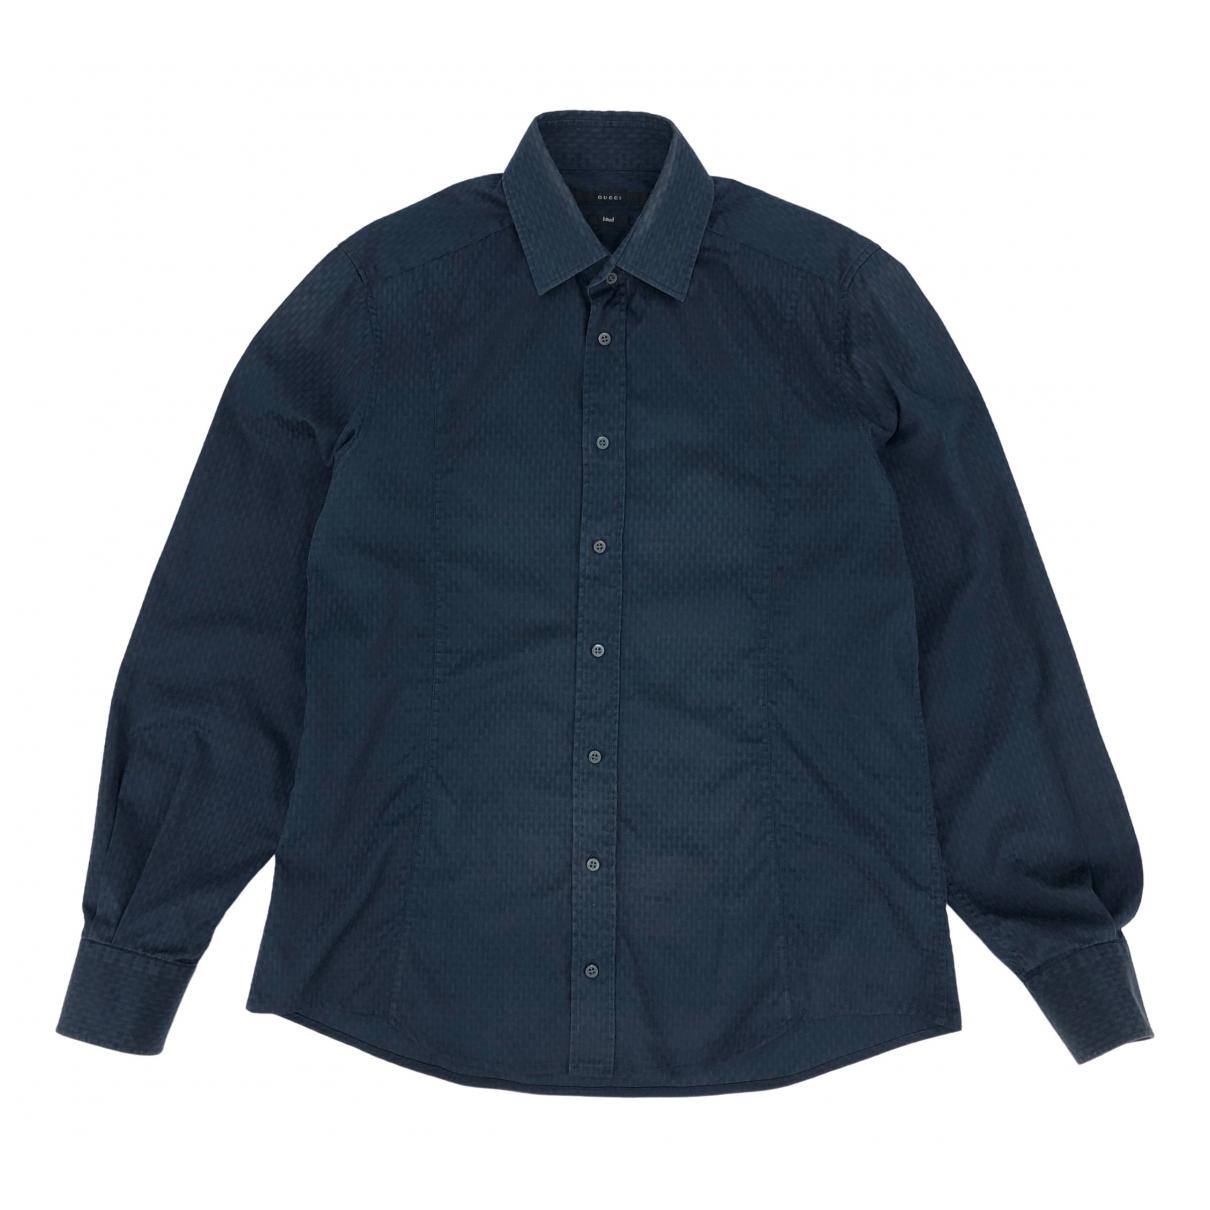 Louis Vuitton \N Hemden in  Blau Baumwolle